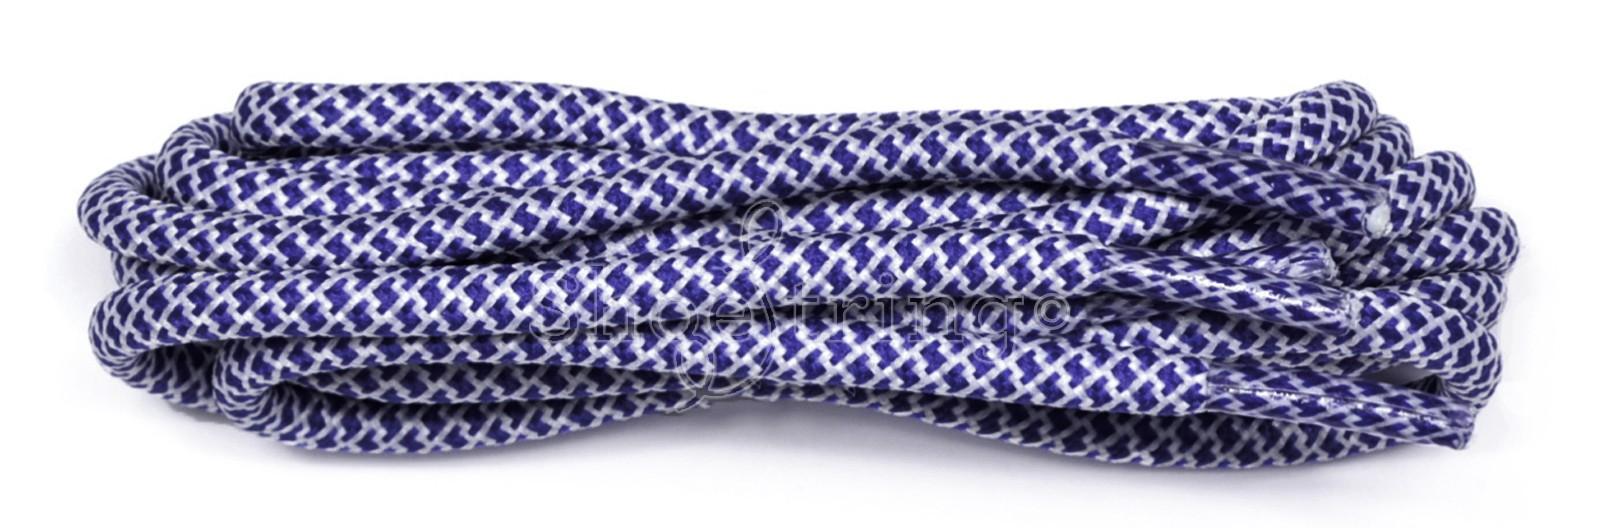 Cobalt-white Honeycomb Rope Laces 120cm